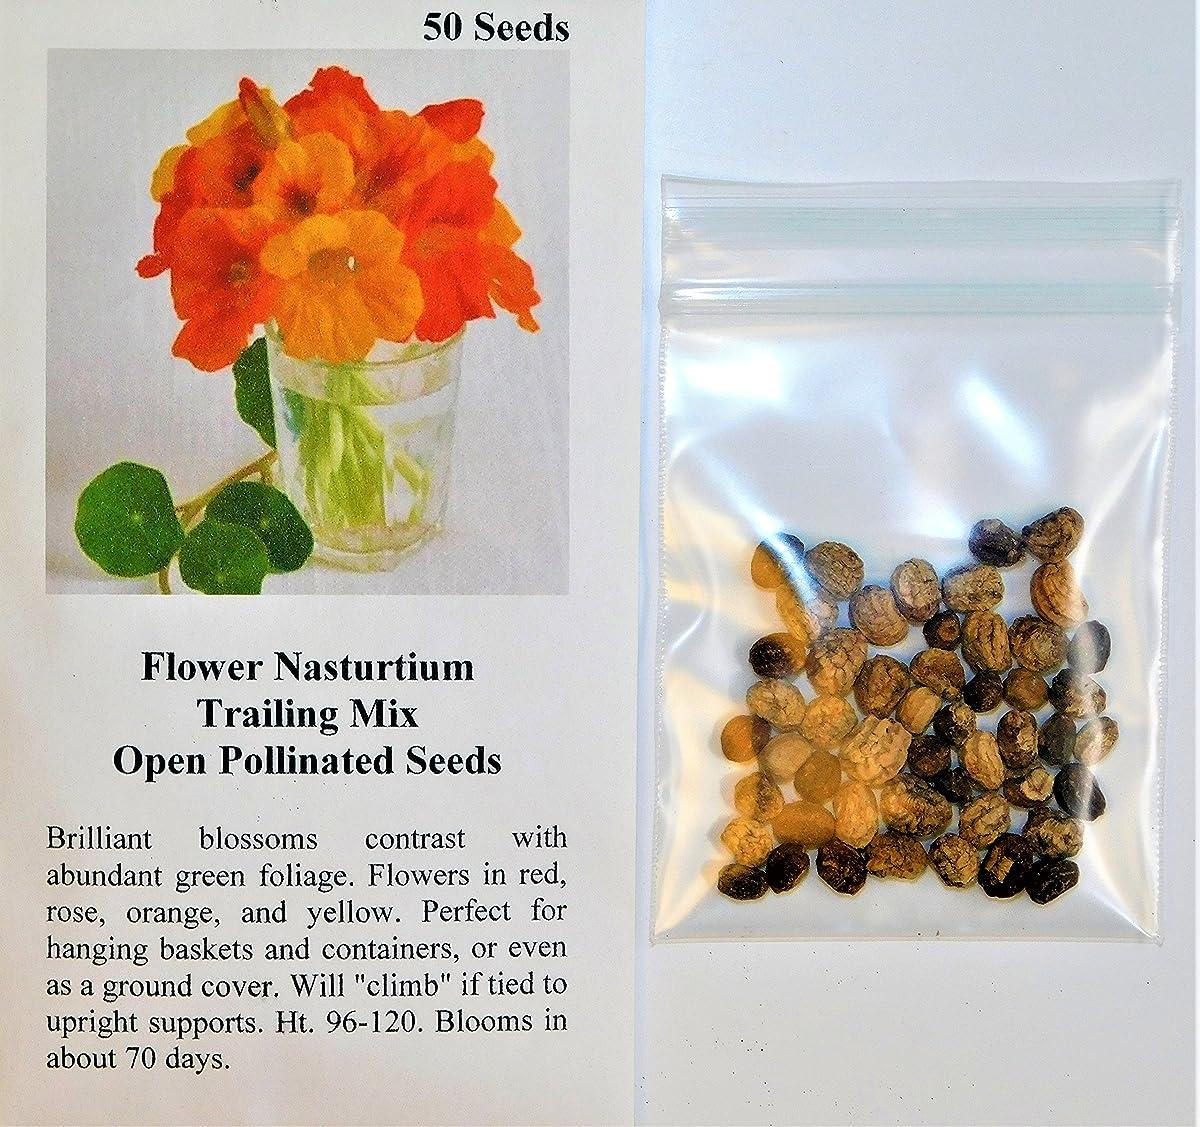 Davids Garden Seeds Flower Nasturtium Trailing Mix SL1201 (Multi) 50 Open Pollinated Seeds